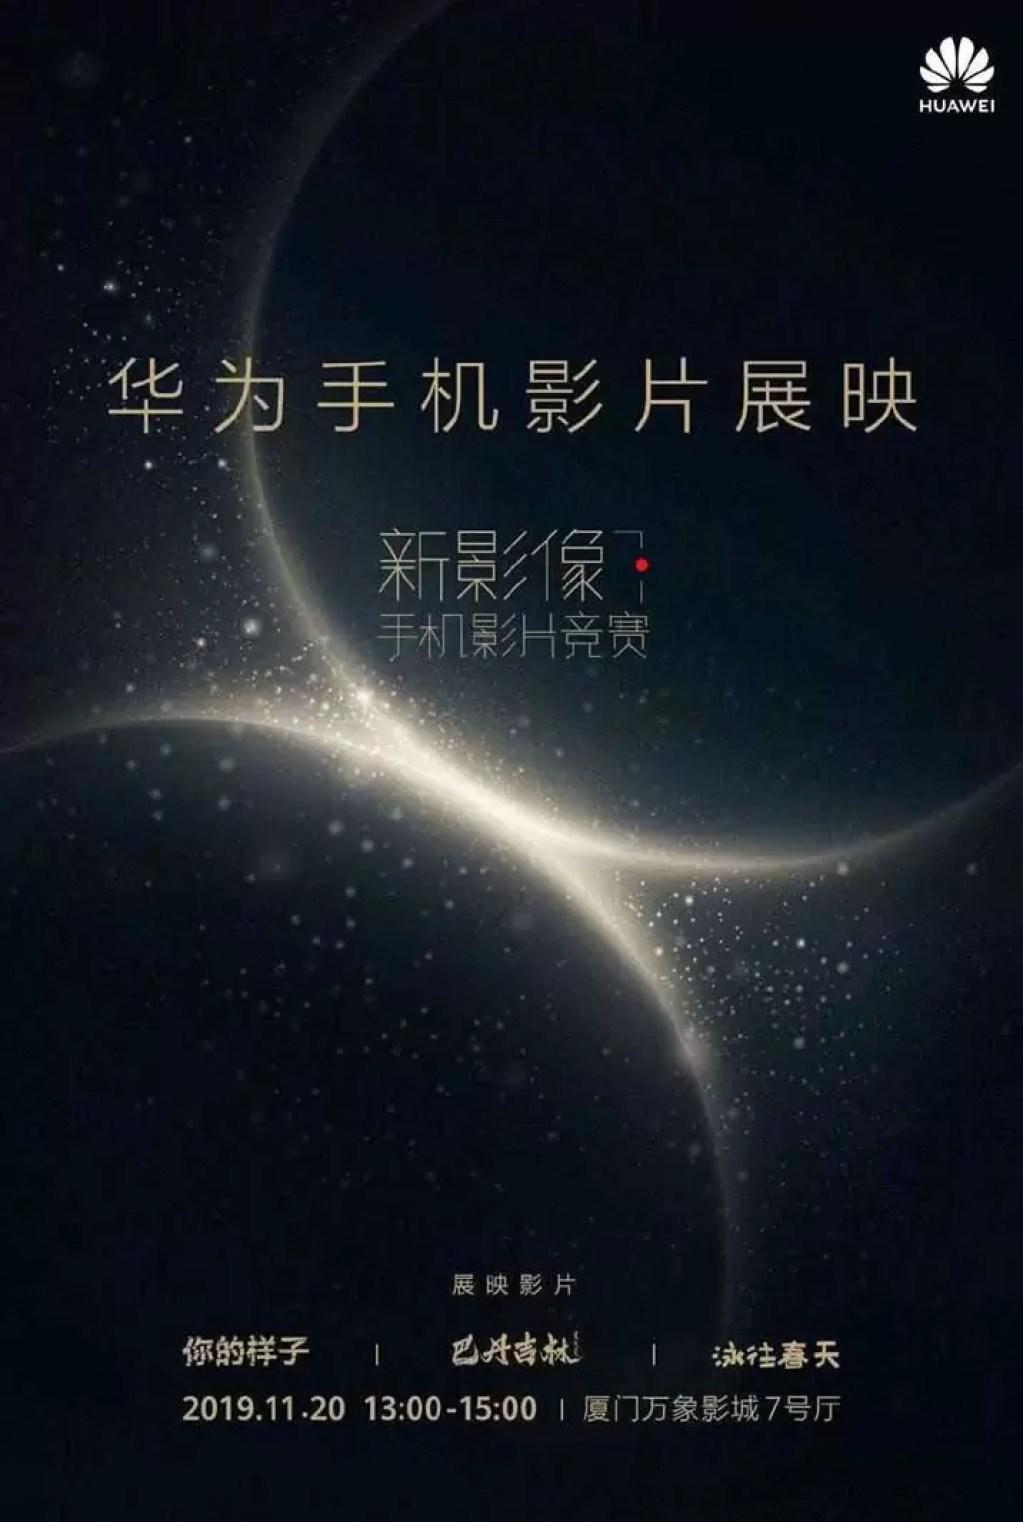 Huawei Mate 30 curtas-metragens em breve